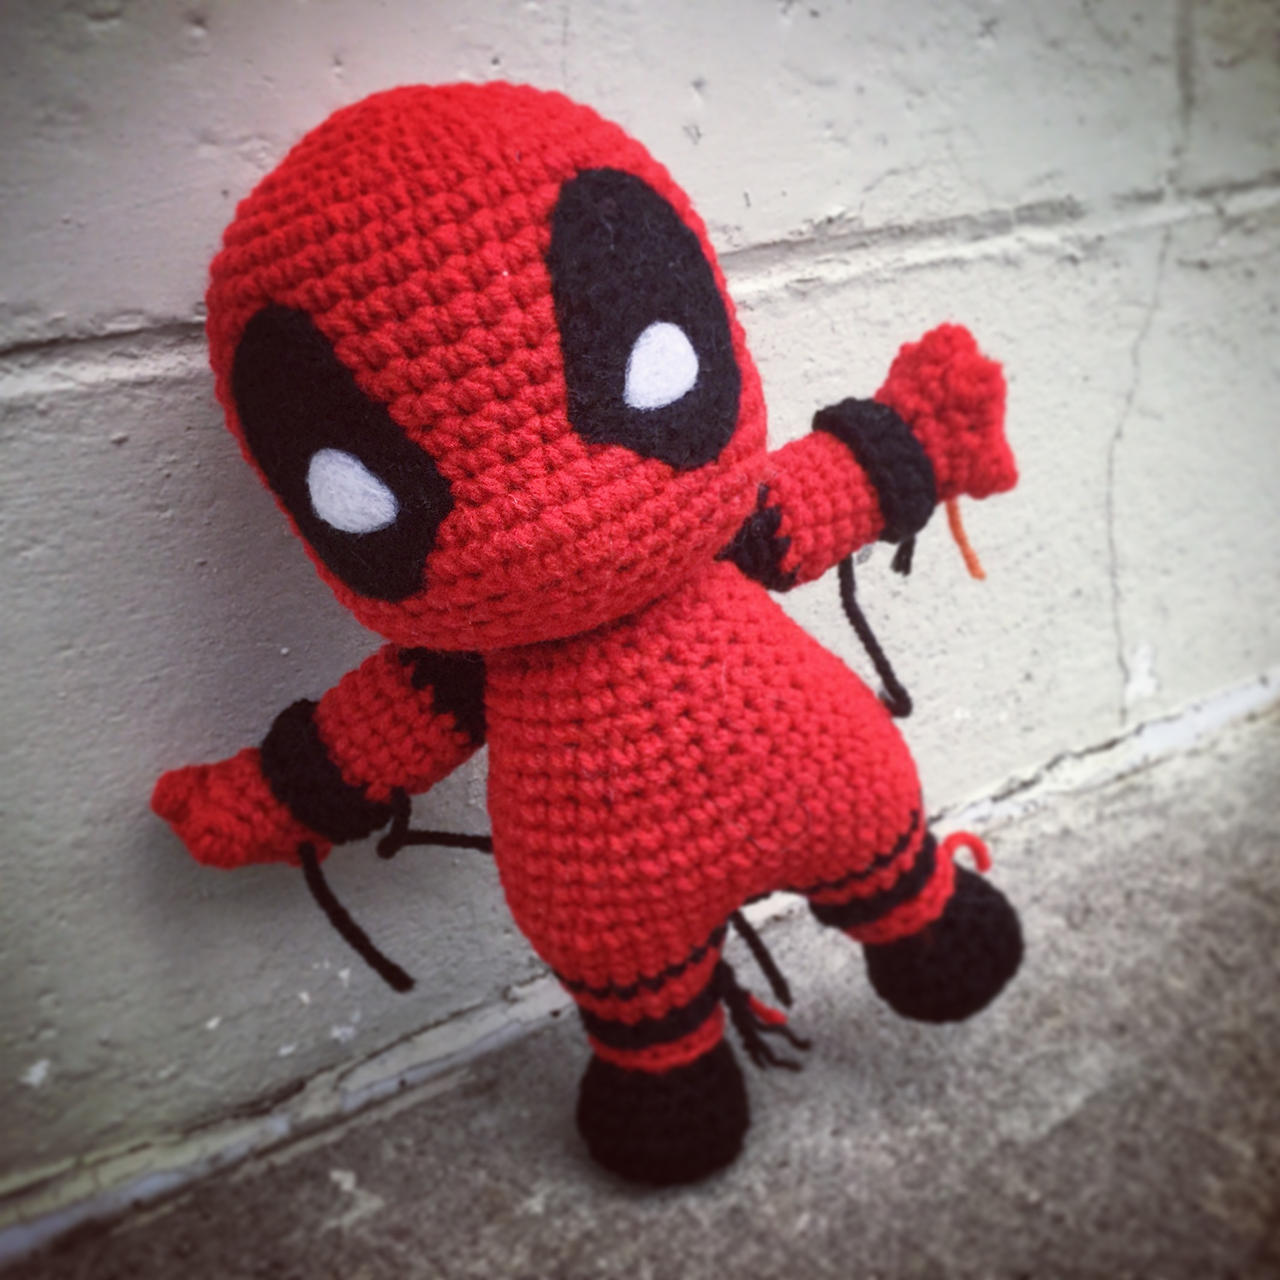 Luxury Free Spiderman Crochet Pattern Crest - Sewing Pattern for ...